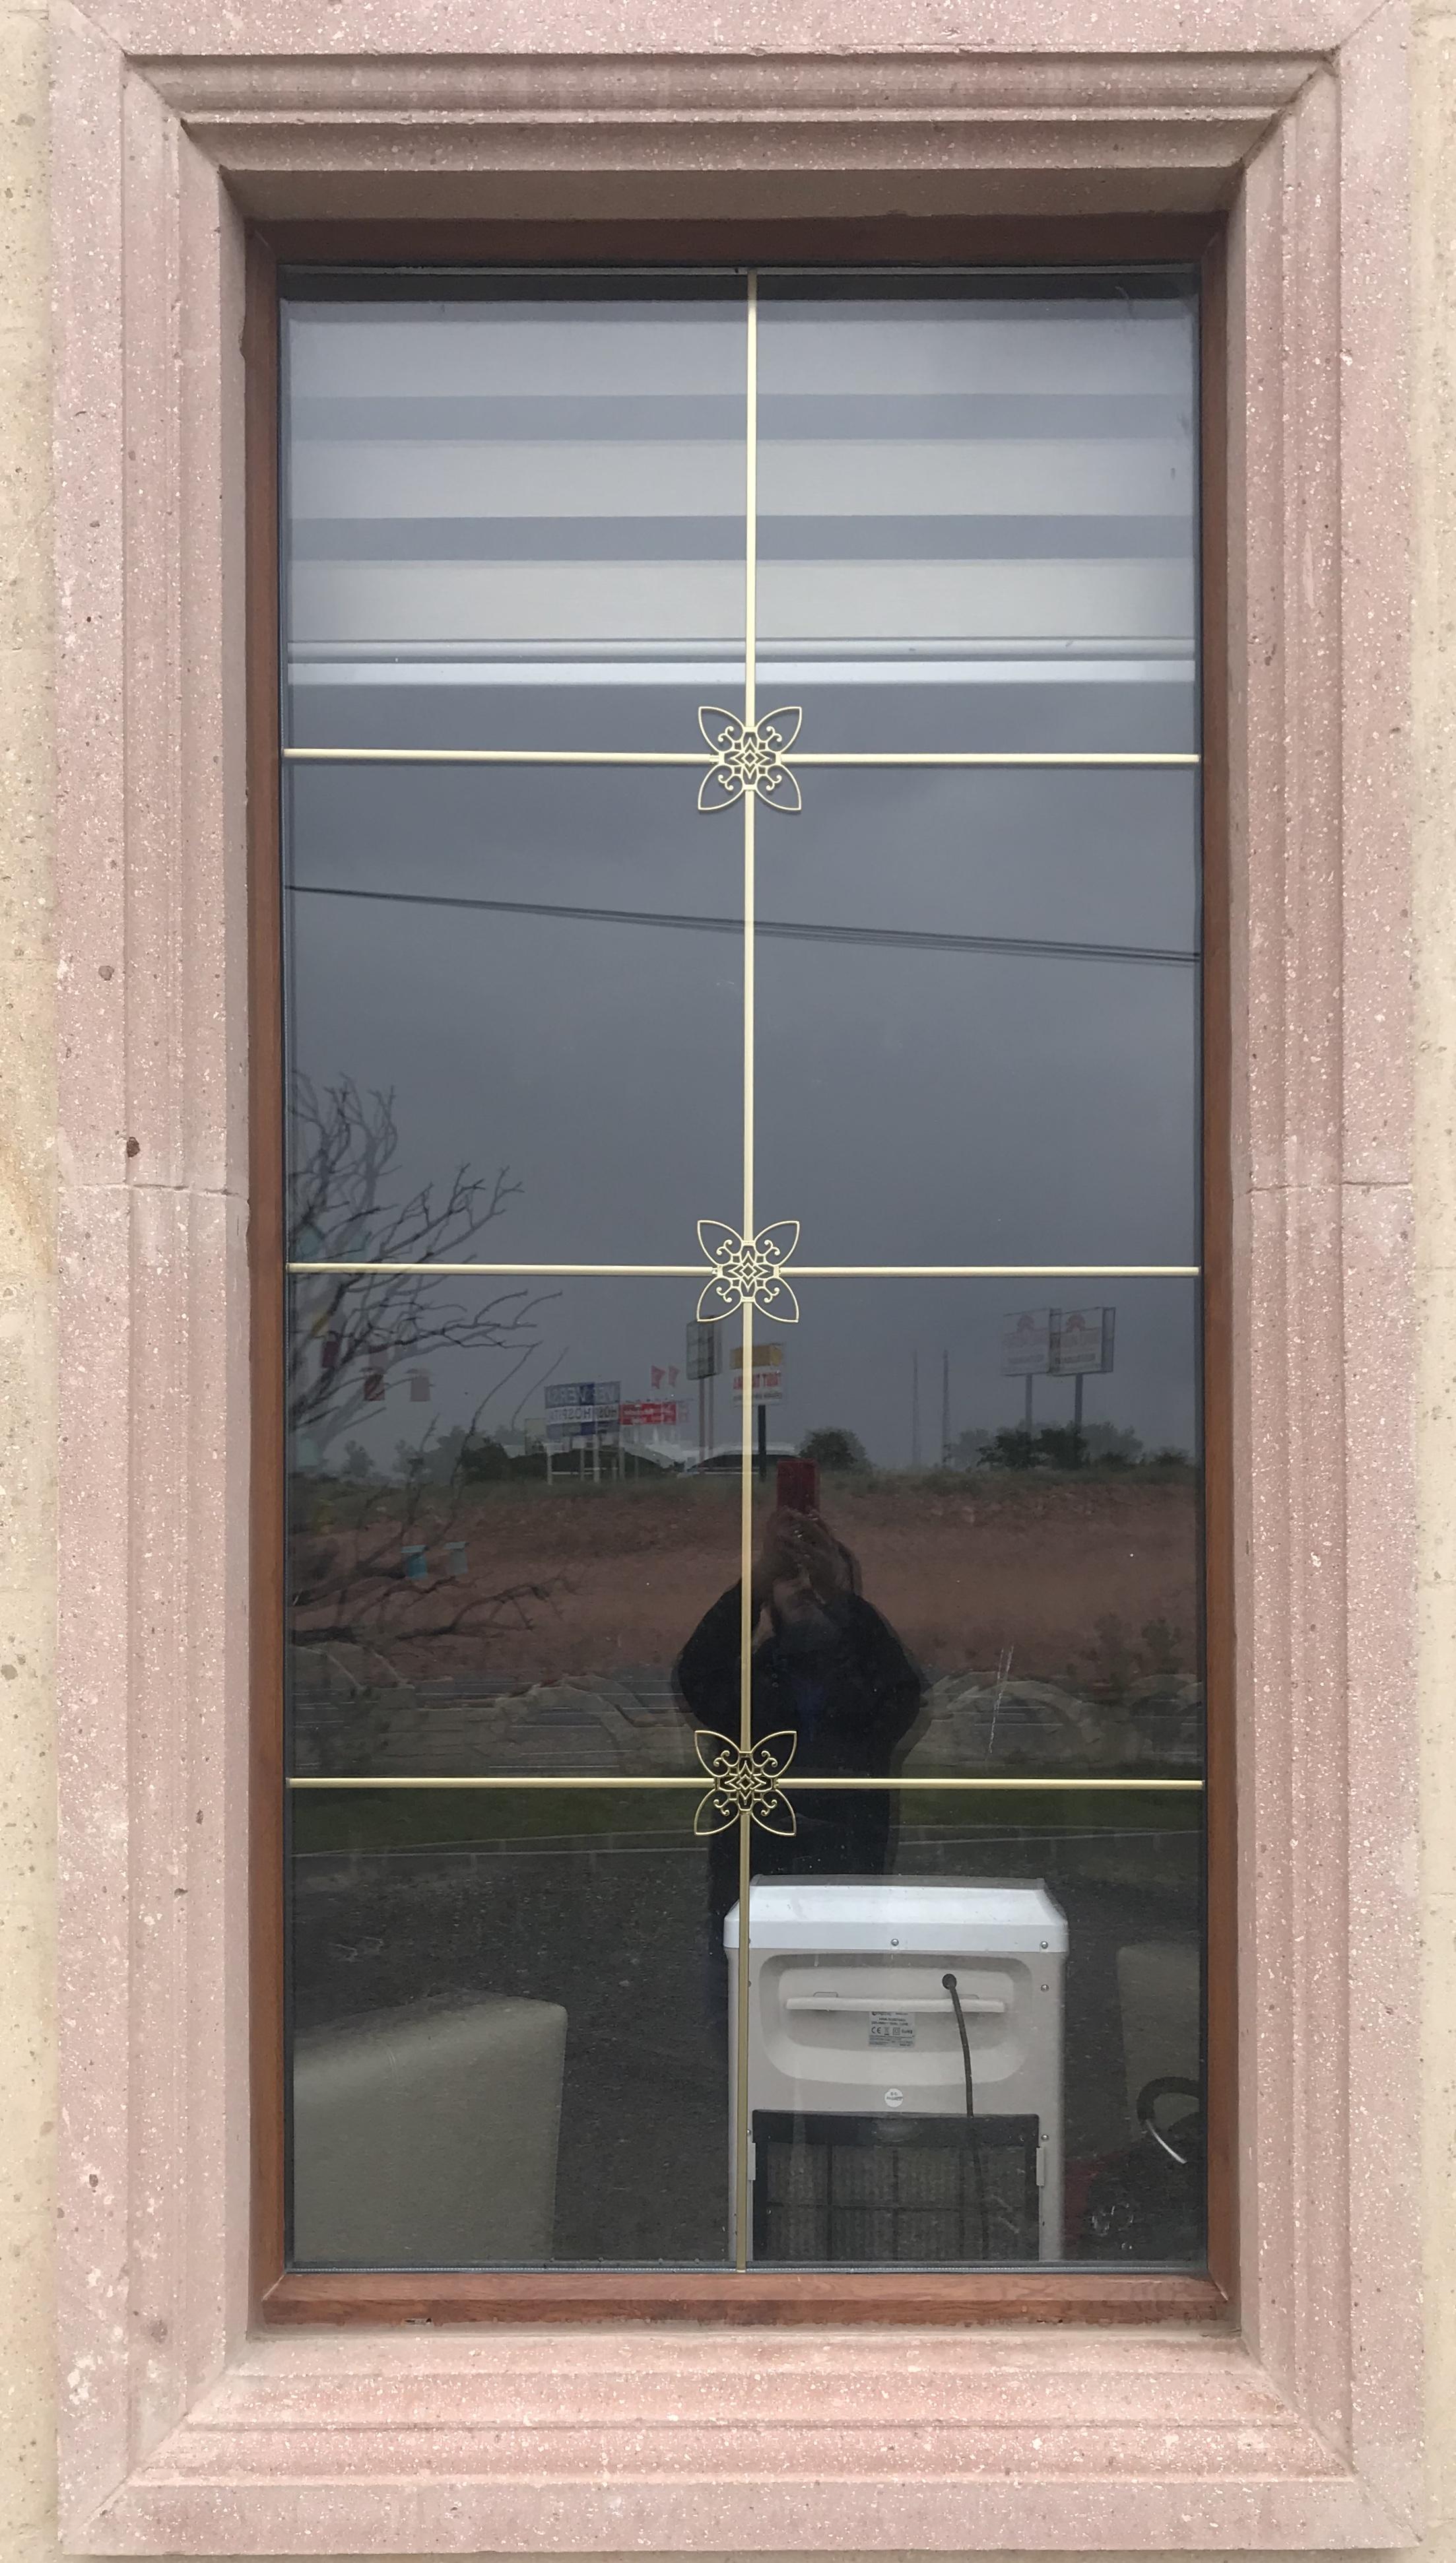 Çift Taraflı Kornişli Pencere Süvesi.jpg